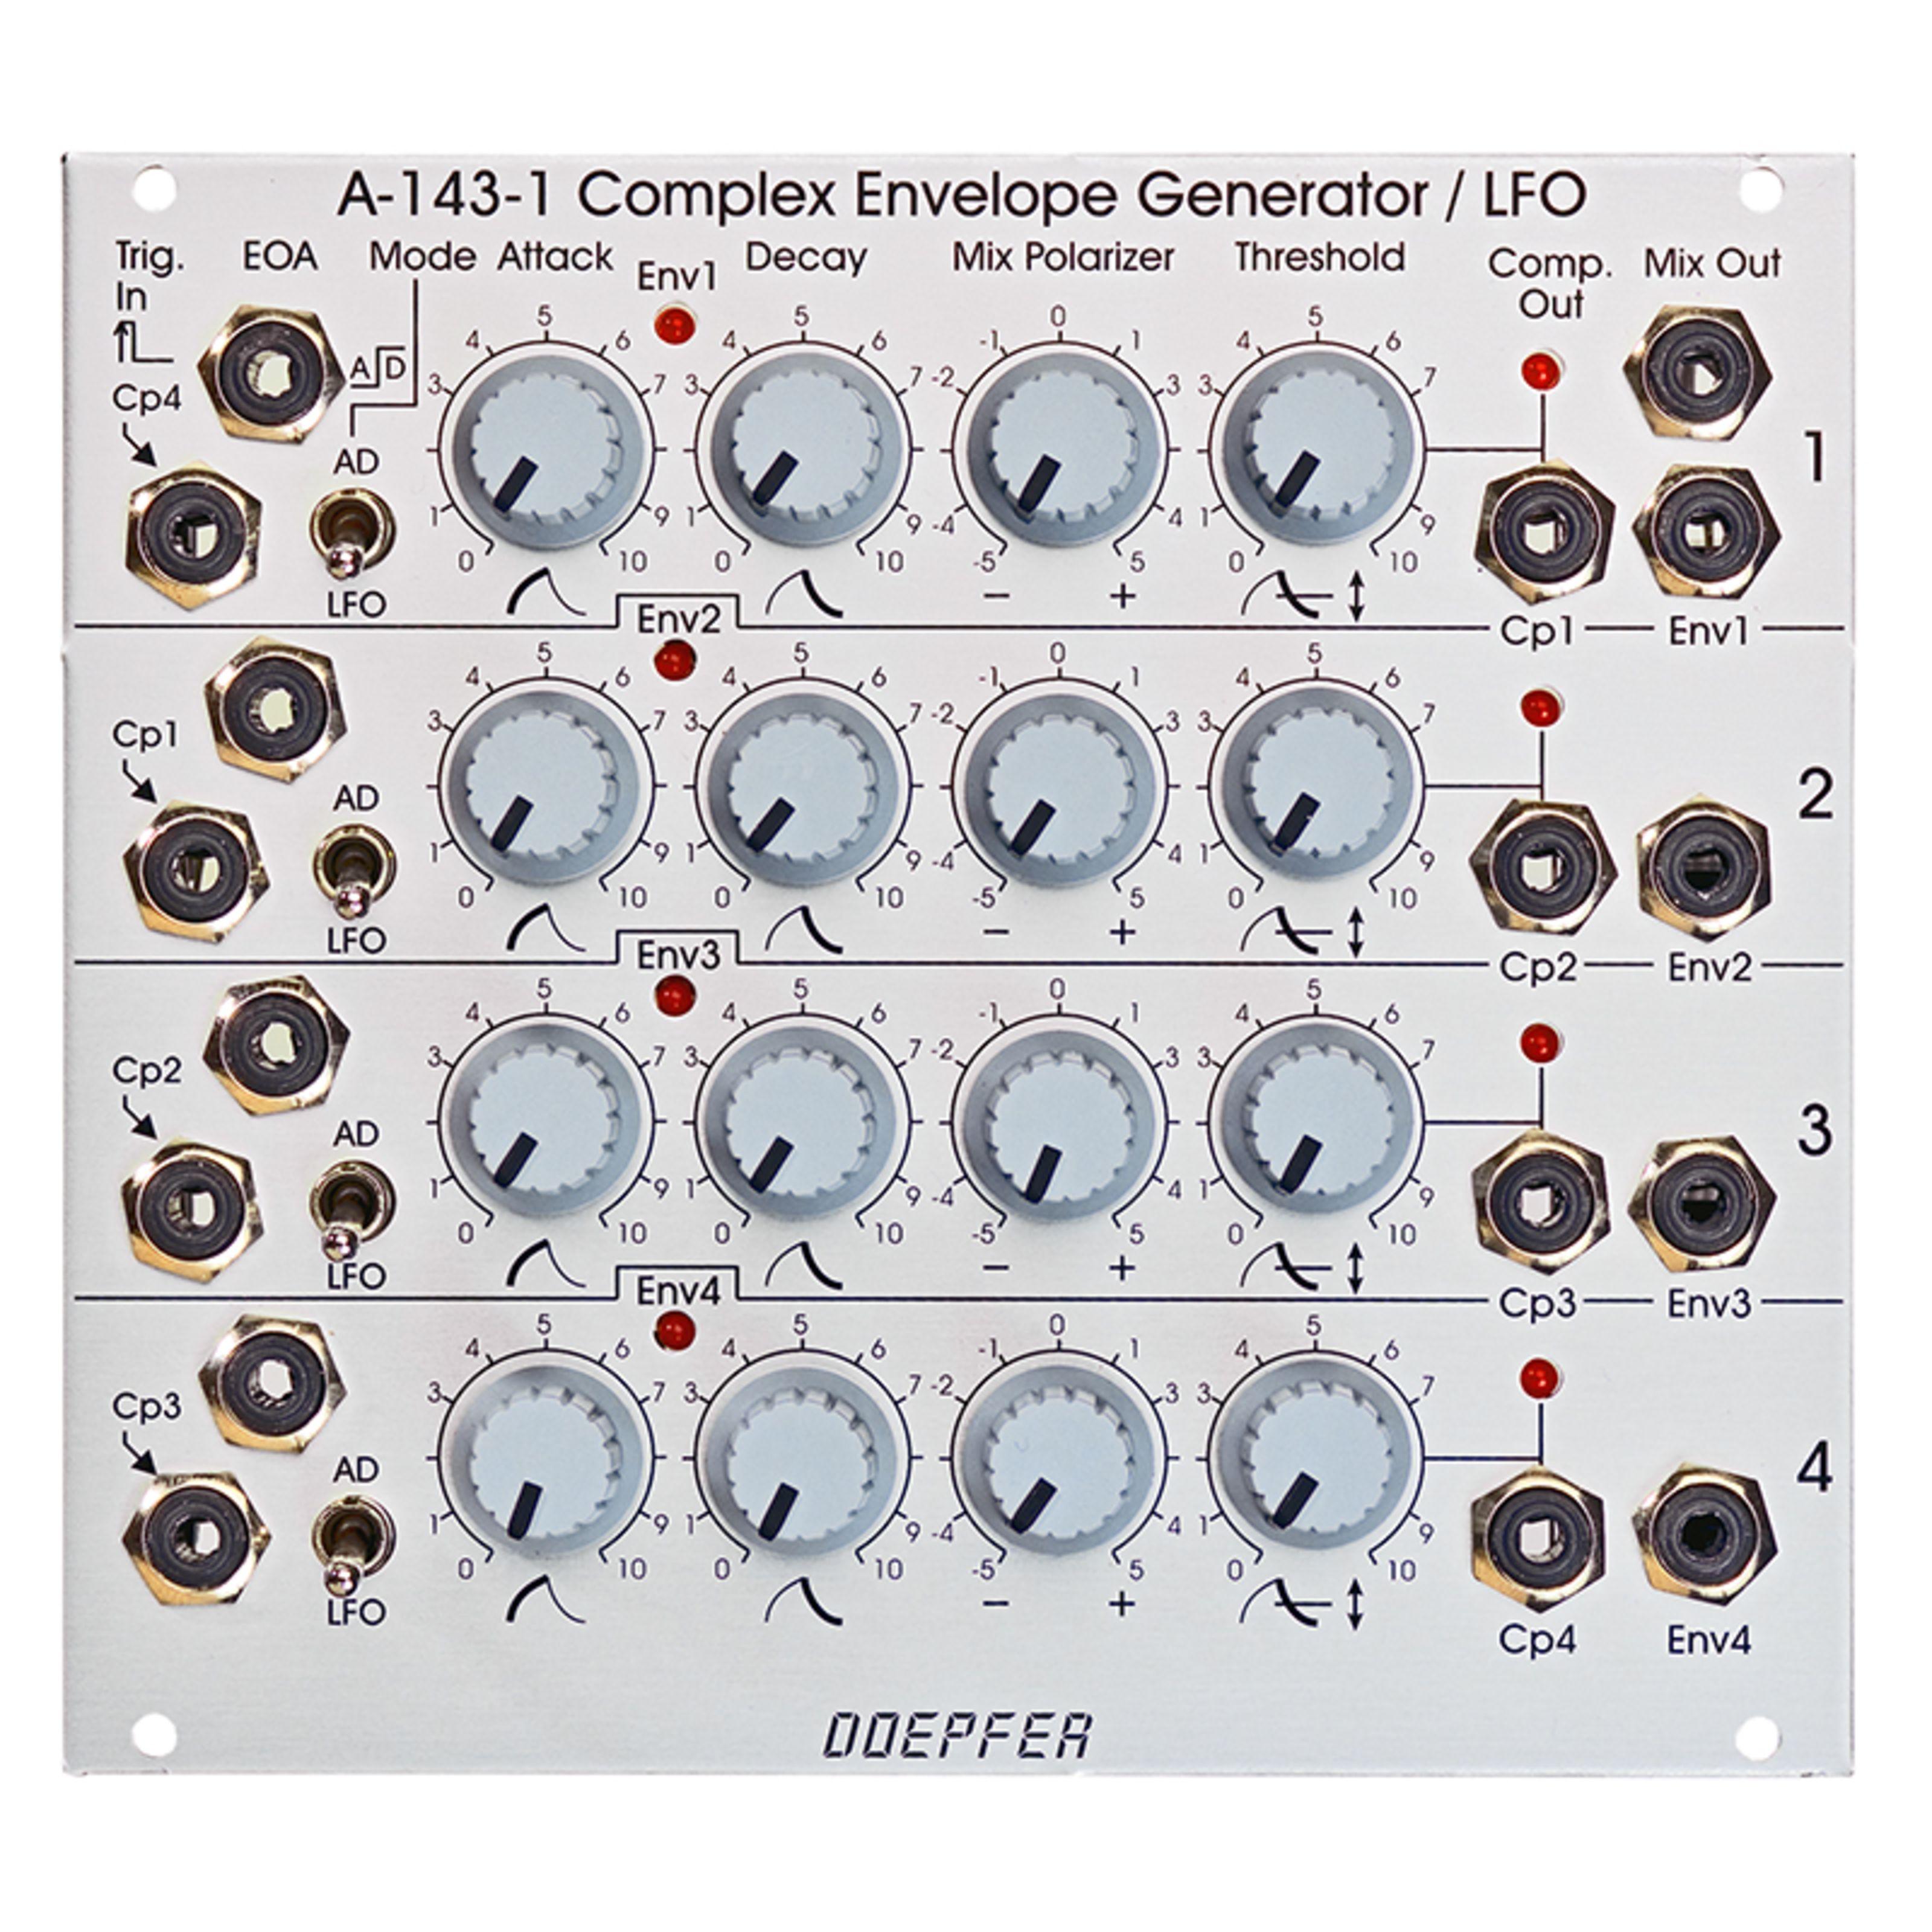 Doepfer - A-143-1 Quad AD Generator